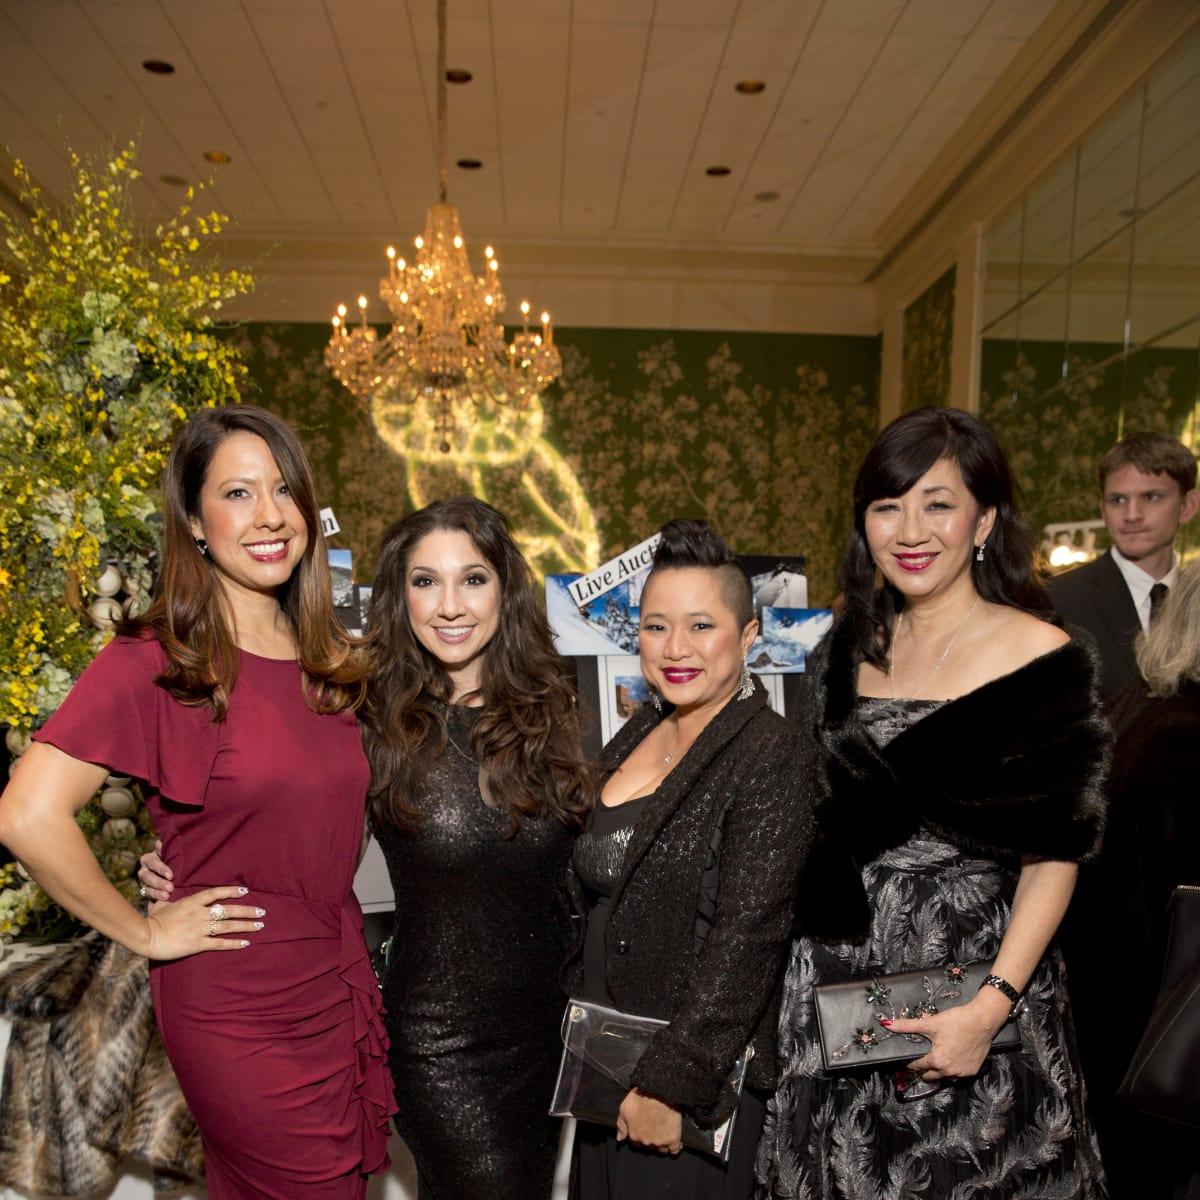 Friends of Fondren Libarary, dinner, Feb. 2016, Anika Jackson, Jill Shull, Sydney Dao, Alice Brams